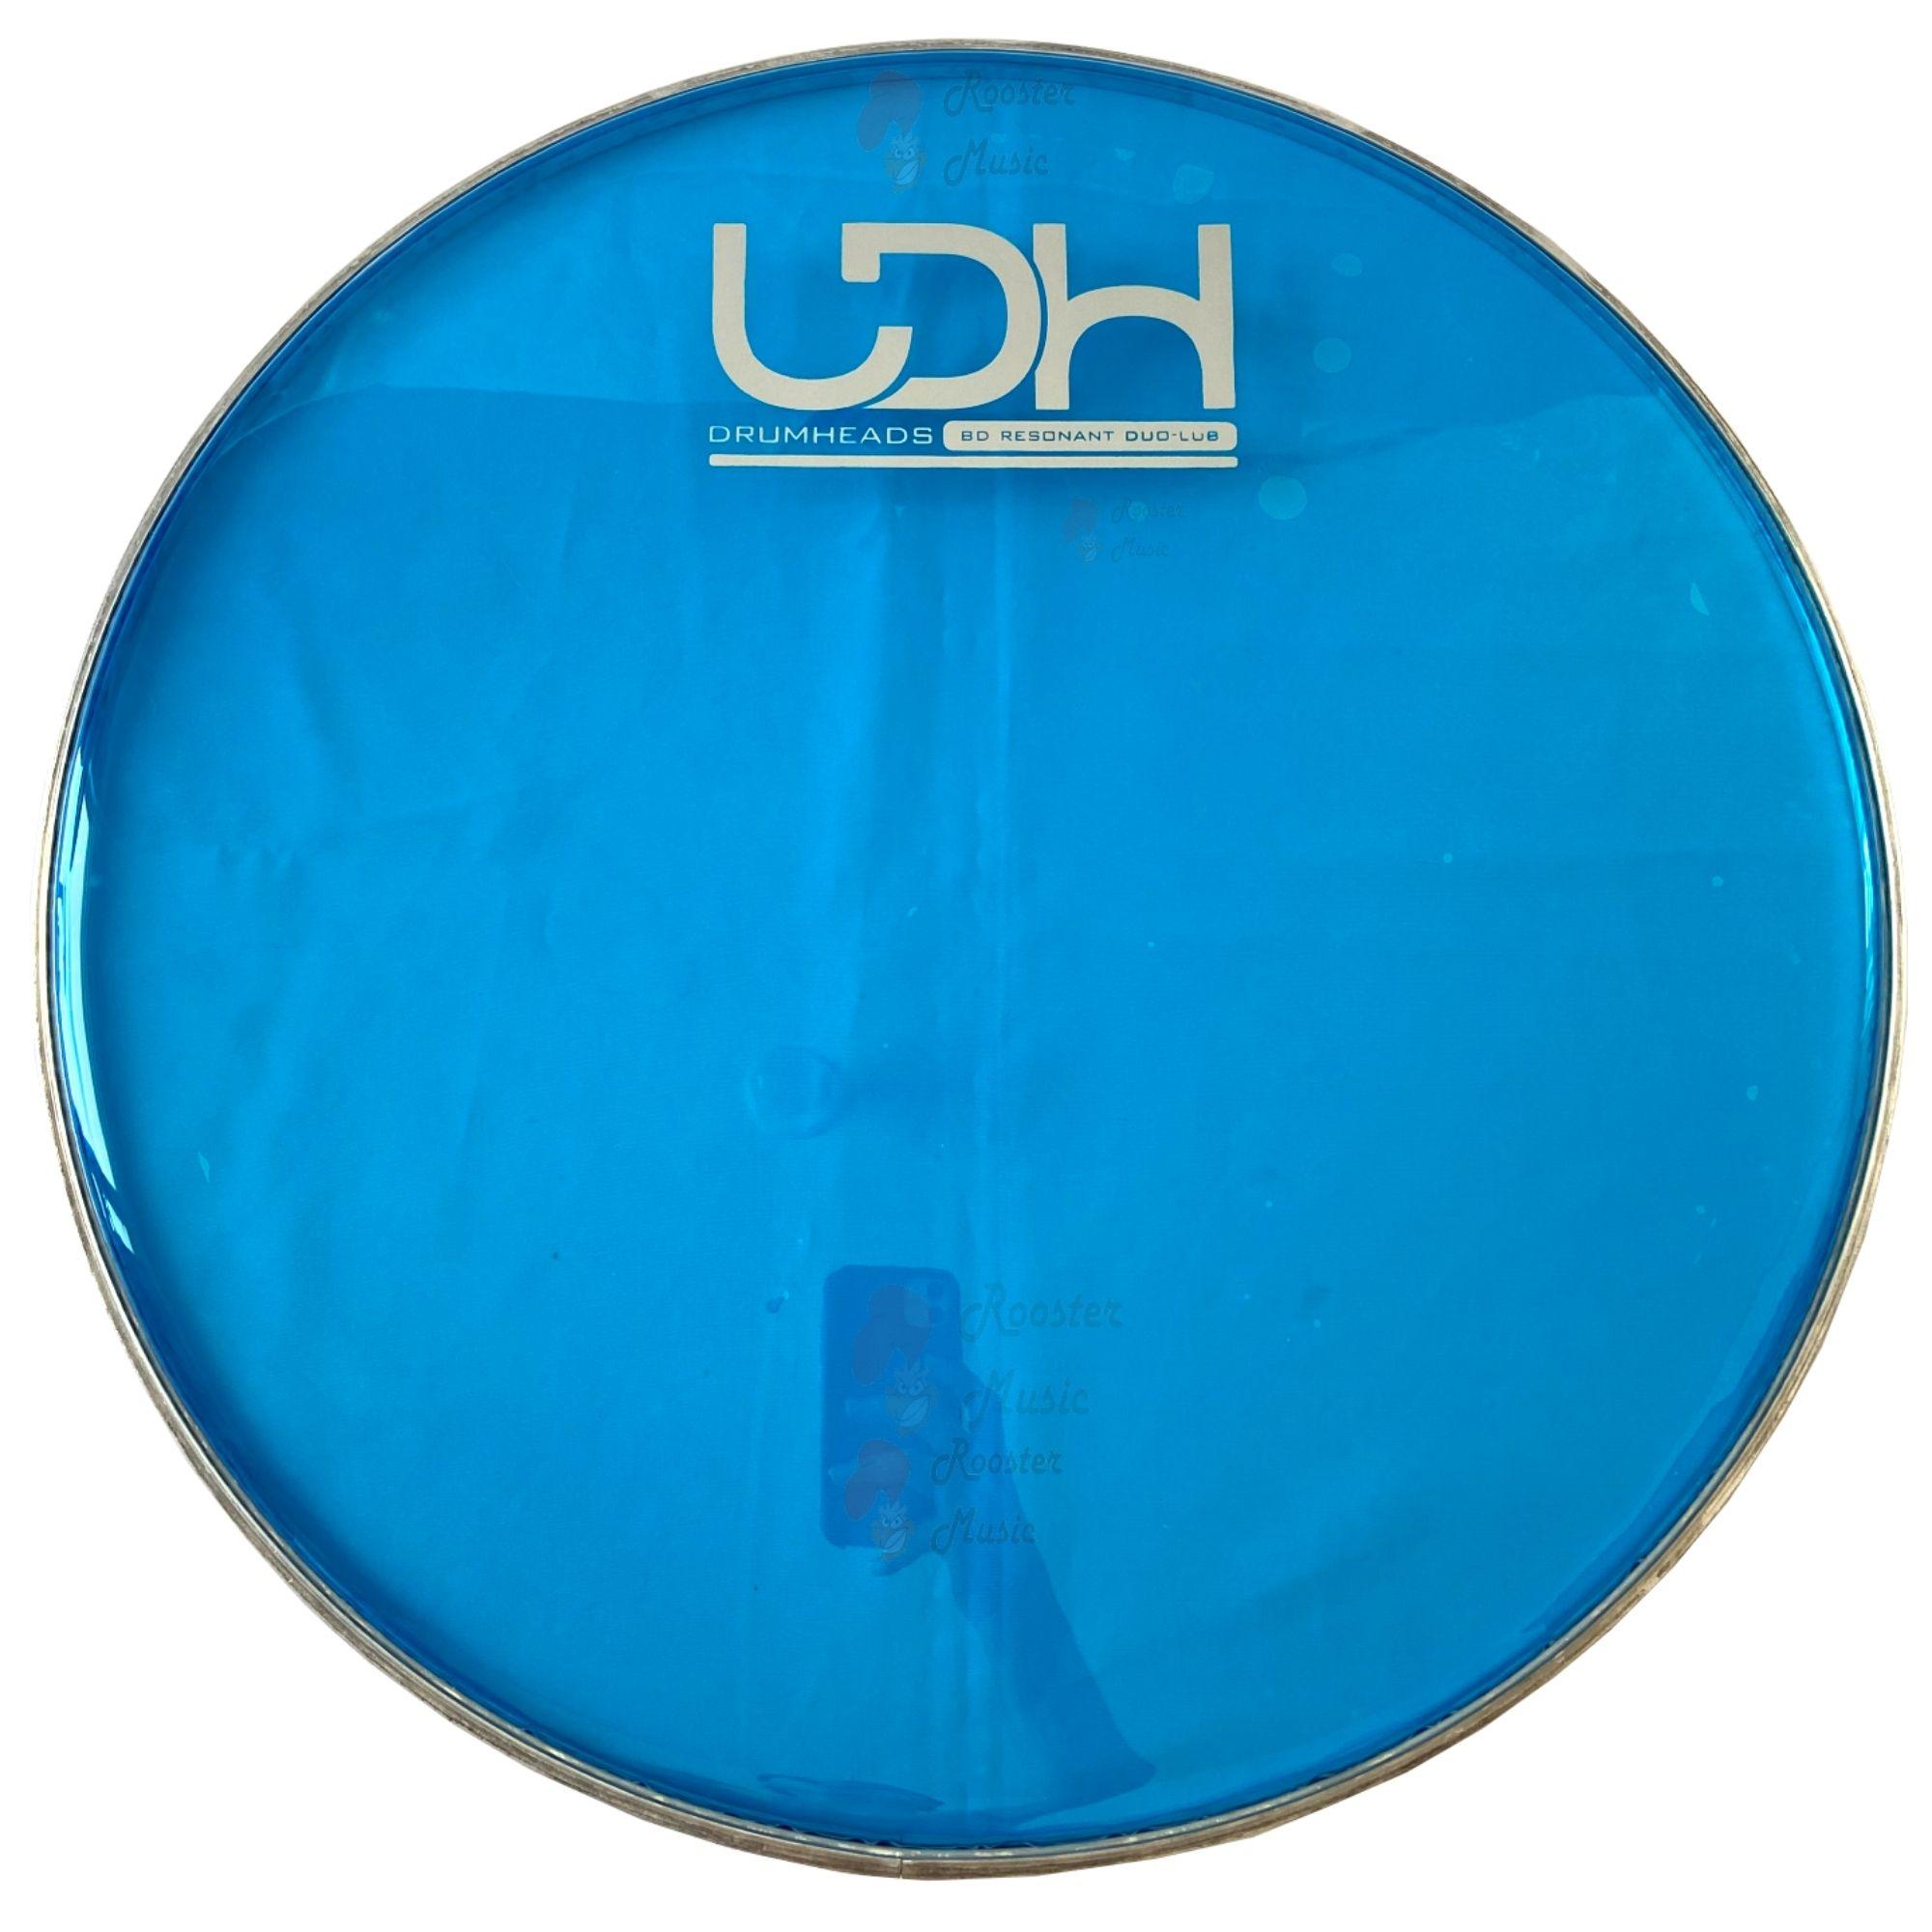 "Pele Hidráulica Duo Lub Clear Luen Drumheads LDH 14"" para Bateria."